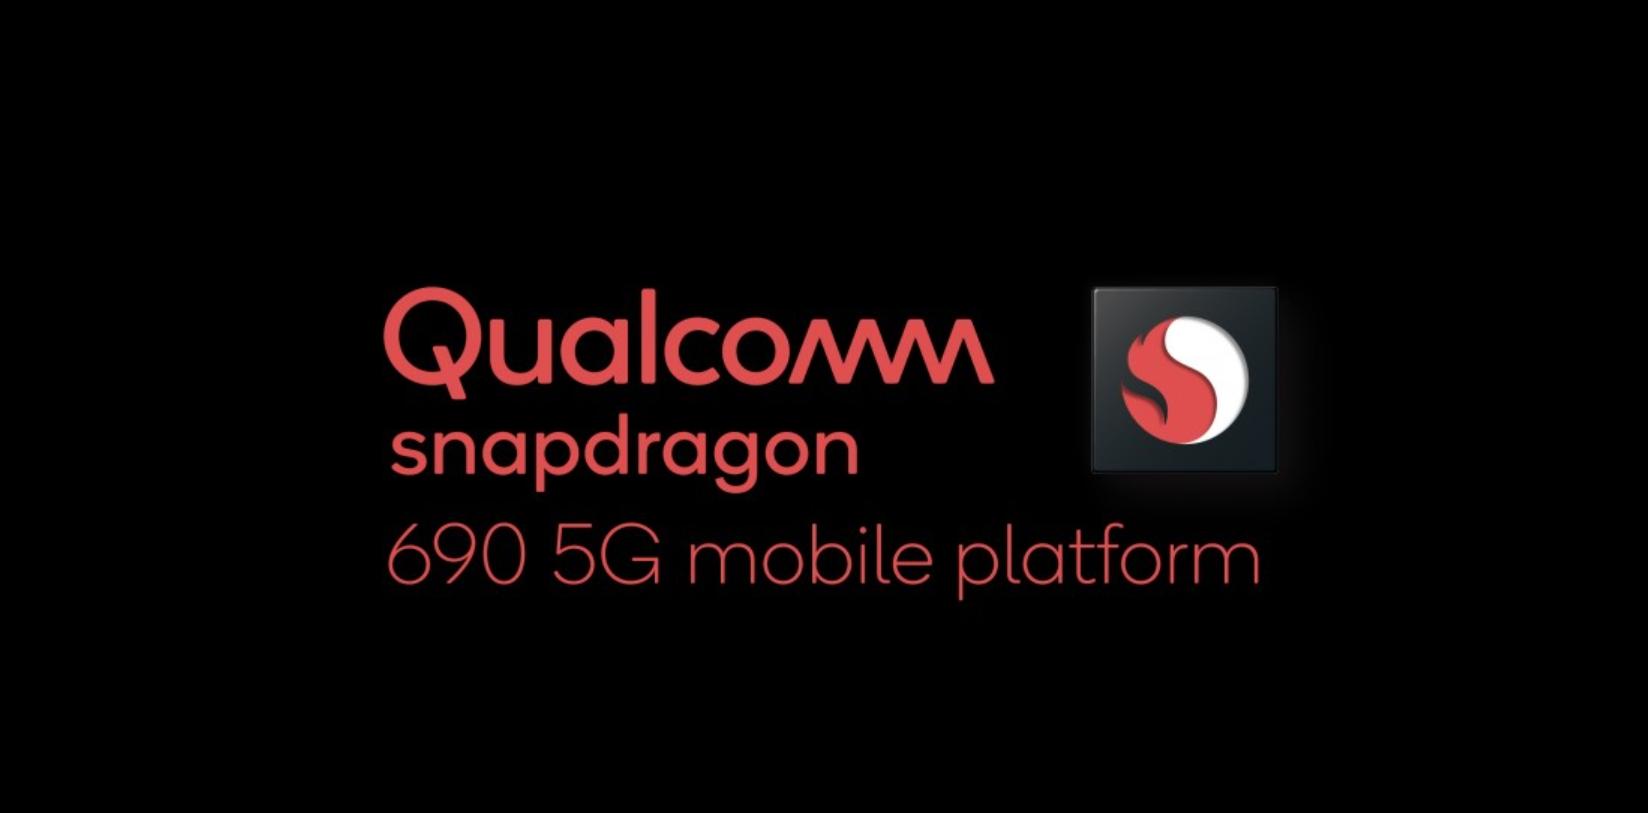 Snapdragon 690 je novinka s 5G pro masy